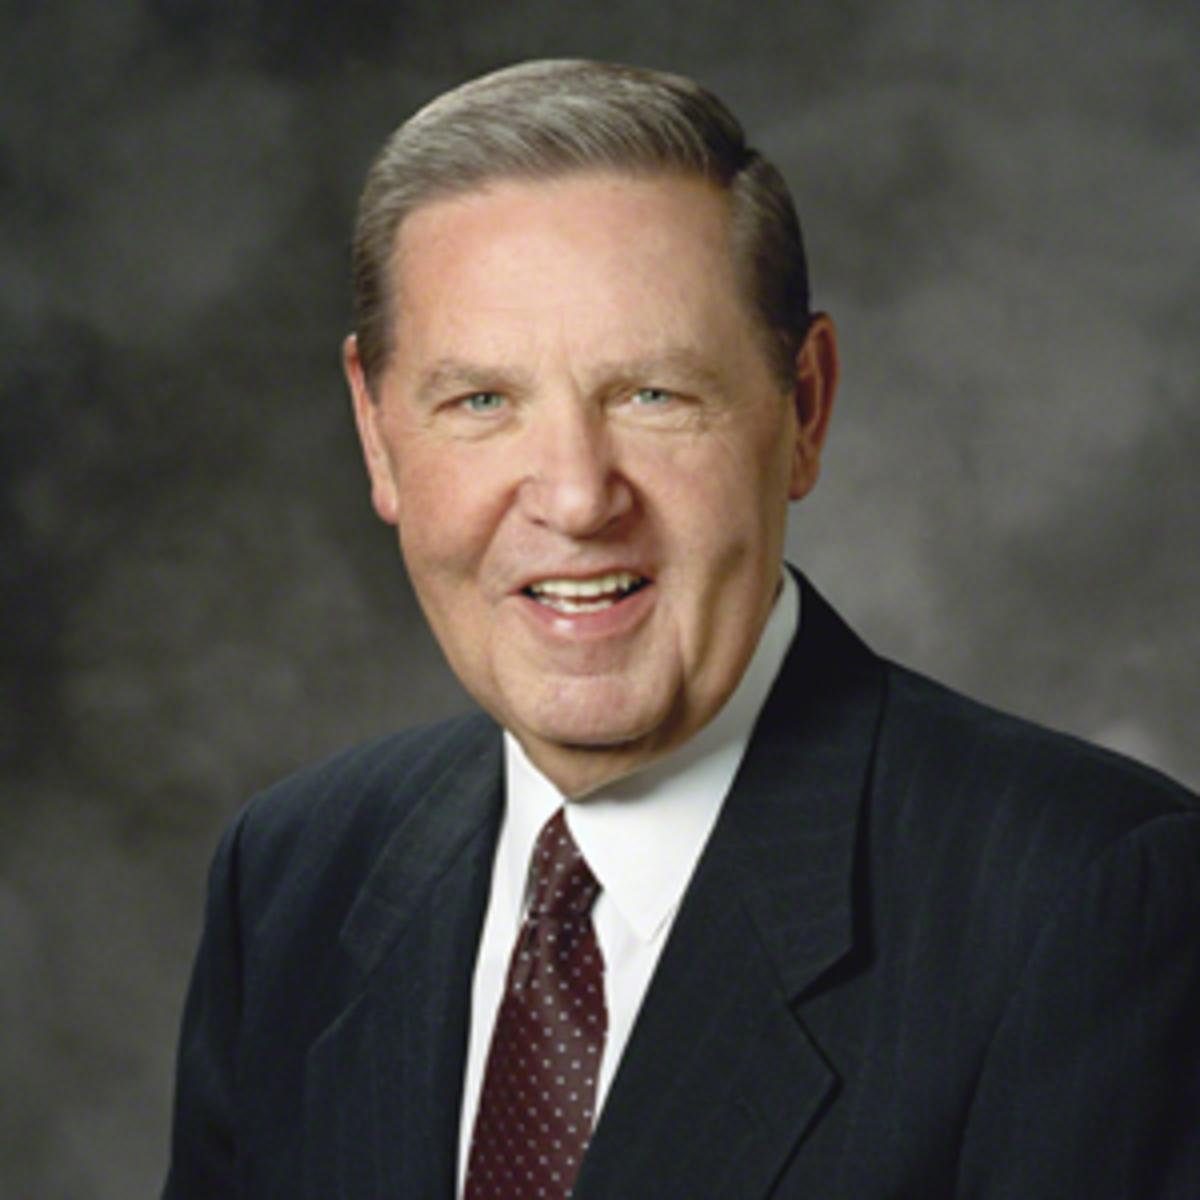 Jeffrey R. Holland an apostle of Jesus Christ